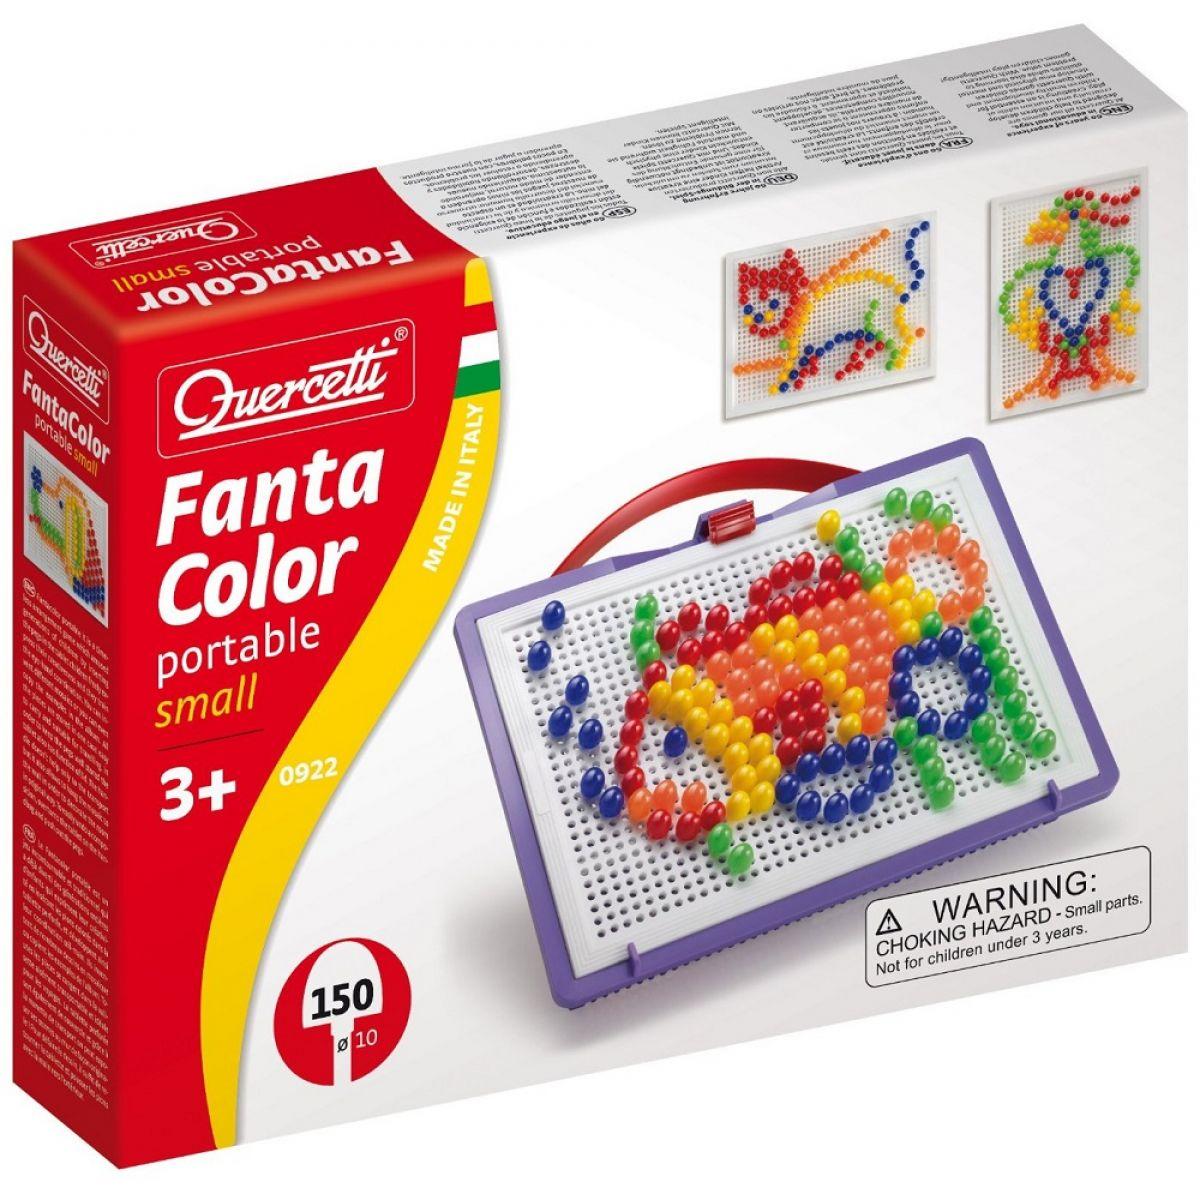 Quercetti Mozaika Fantacolor Portable 150 ks ryba